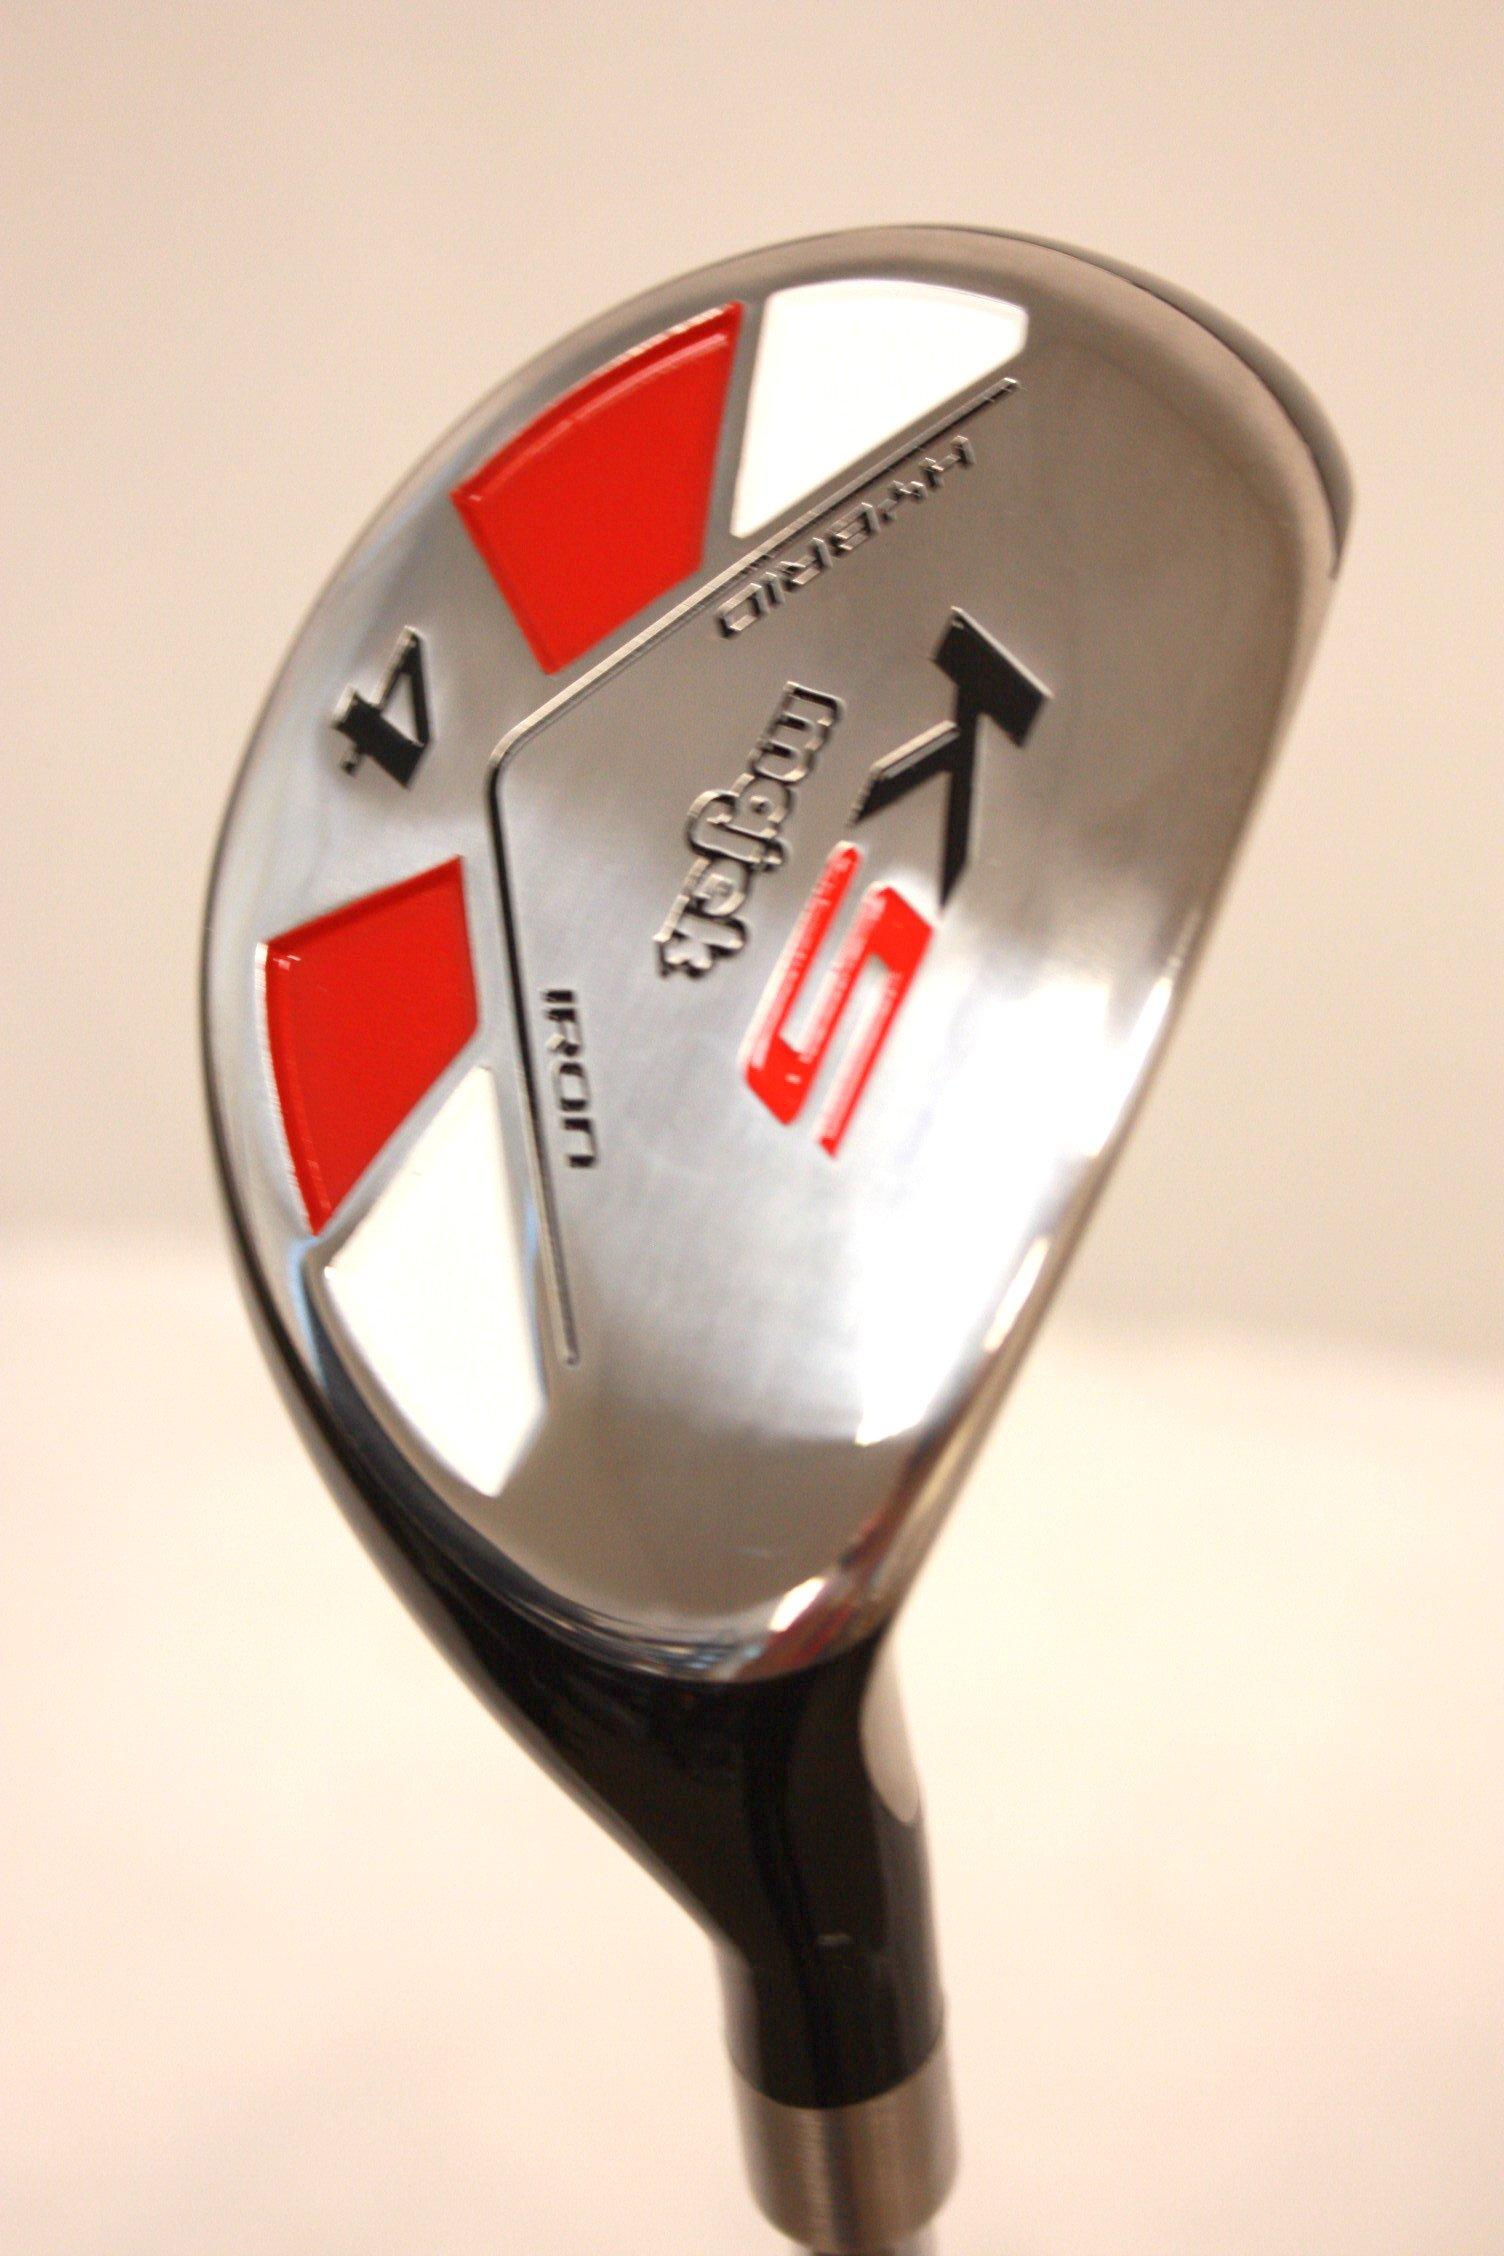 Majek Golf All Hybrid #4 Regular Flex Right Handed New Utility R Flex Club by Majek